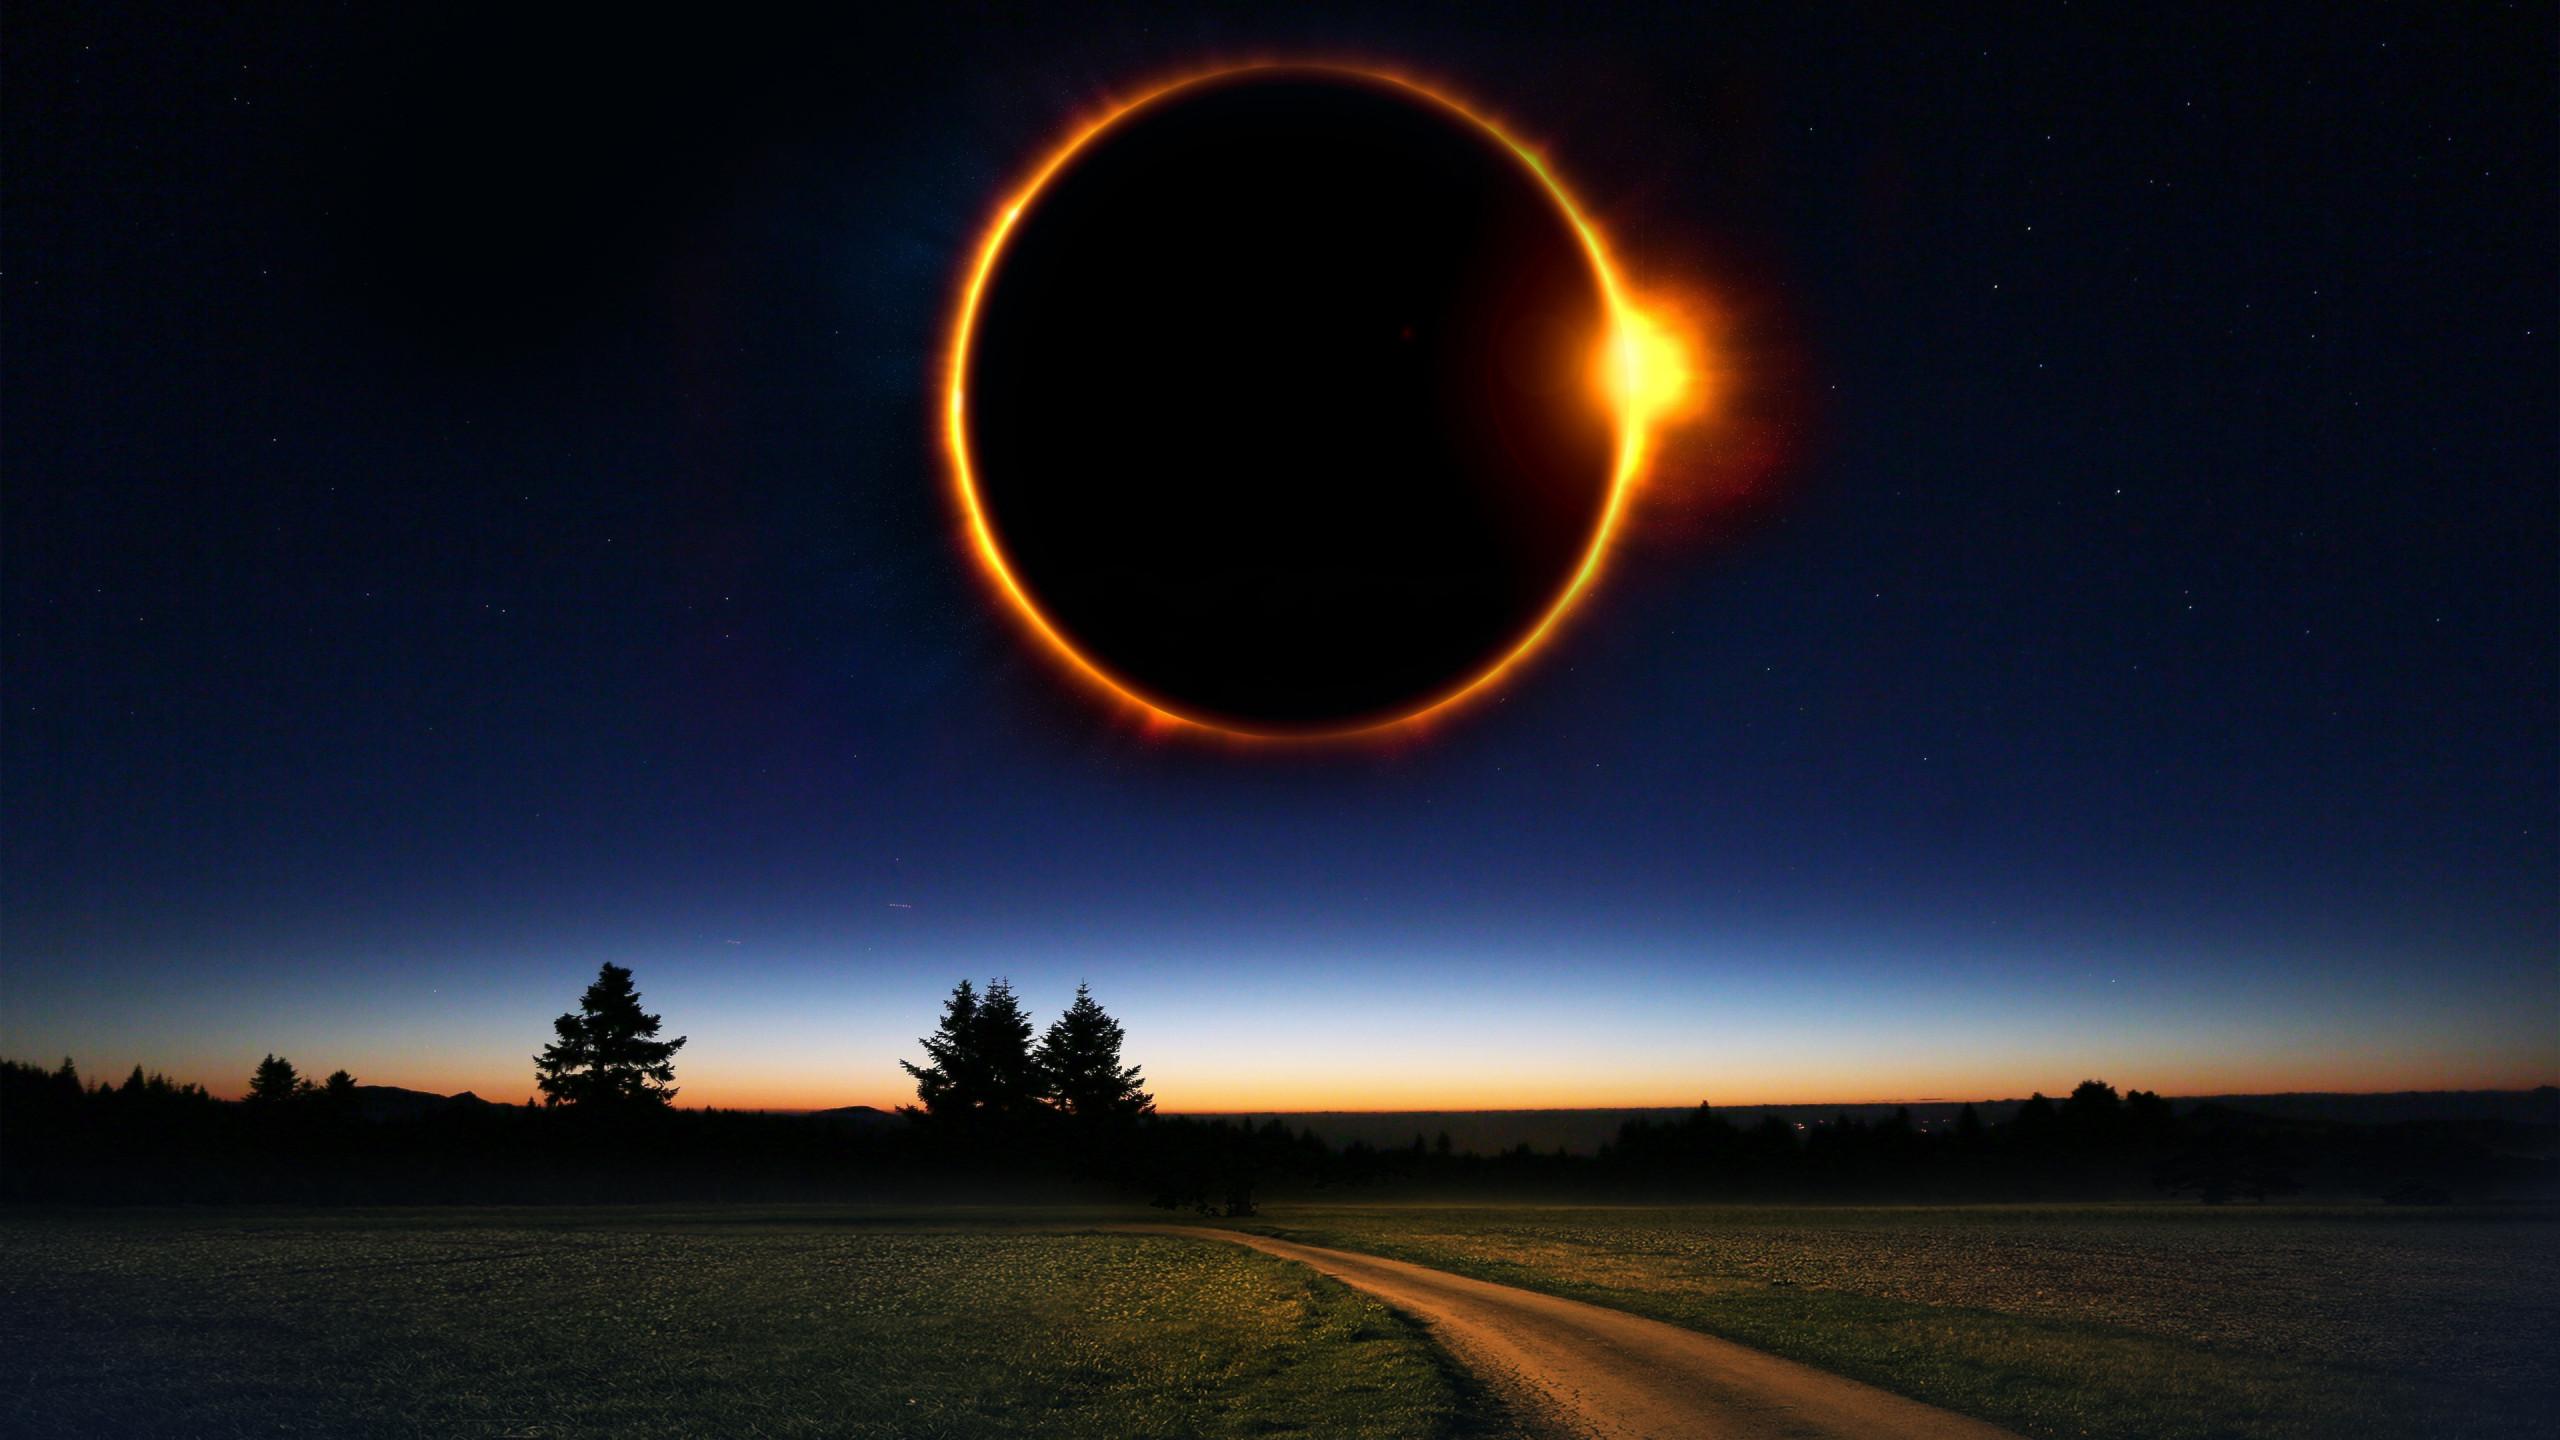 Download Wallpaper Fantasy Solar Eclipse 2560x1440